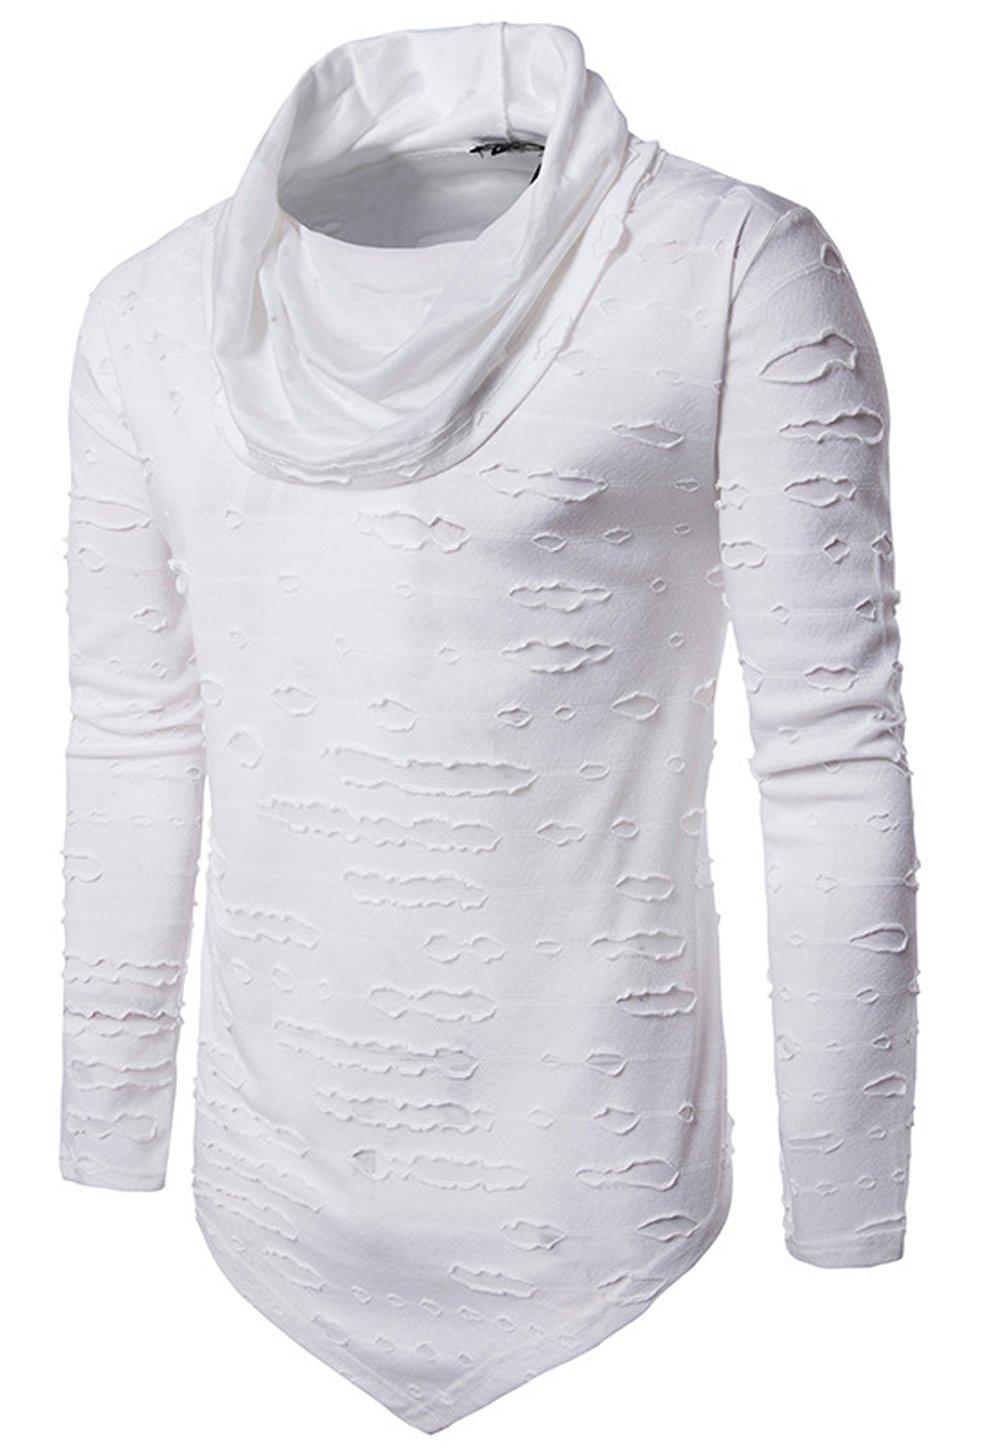 Hotmiss Men's Pure Colour Hipster Hiphop Holes Design Hem Heaps Collar Long Sleeve T-Shirt (White, Large)